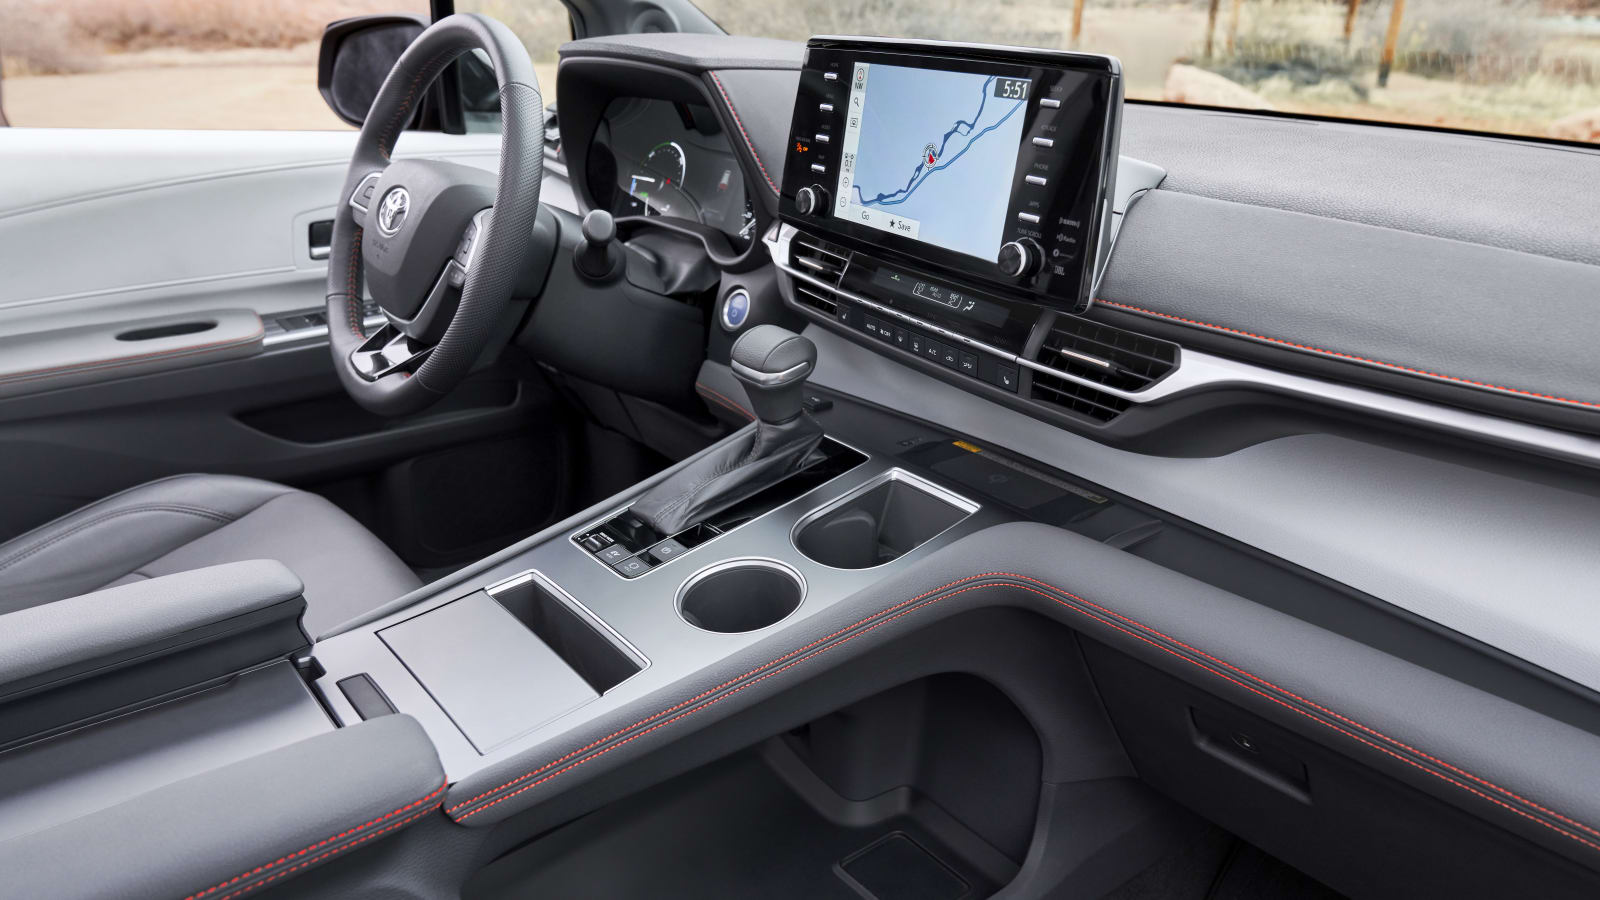 2021 toyota sienna hybrid minivan revealed with photos specs details autoblog 2021 toyota sienna hybrid minivan